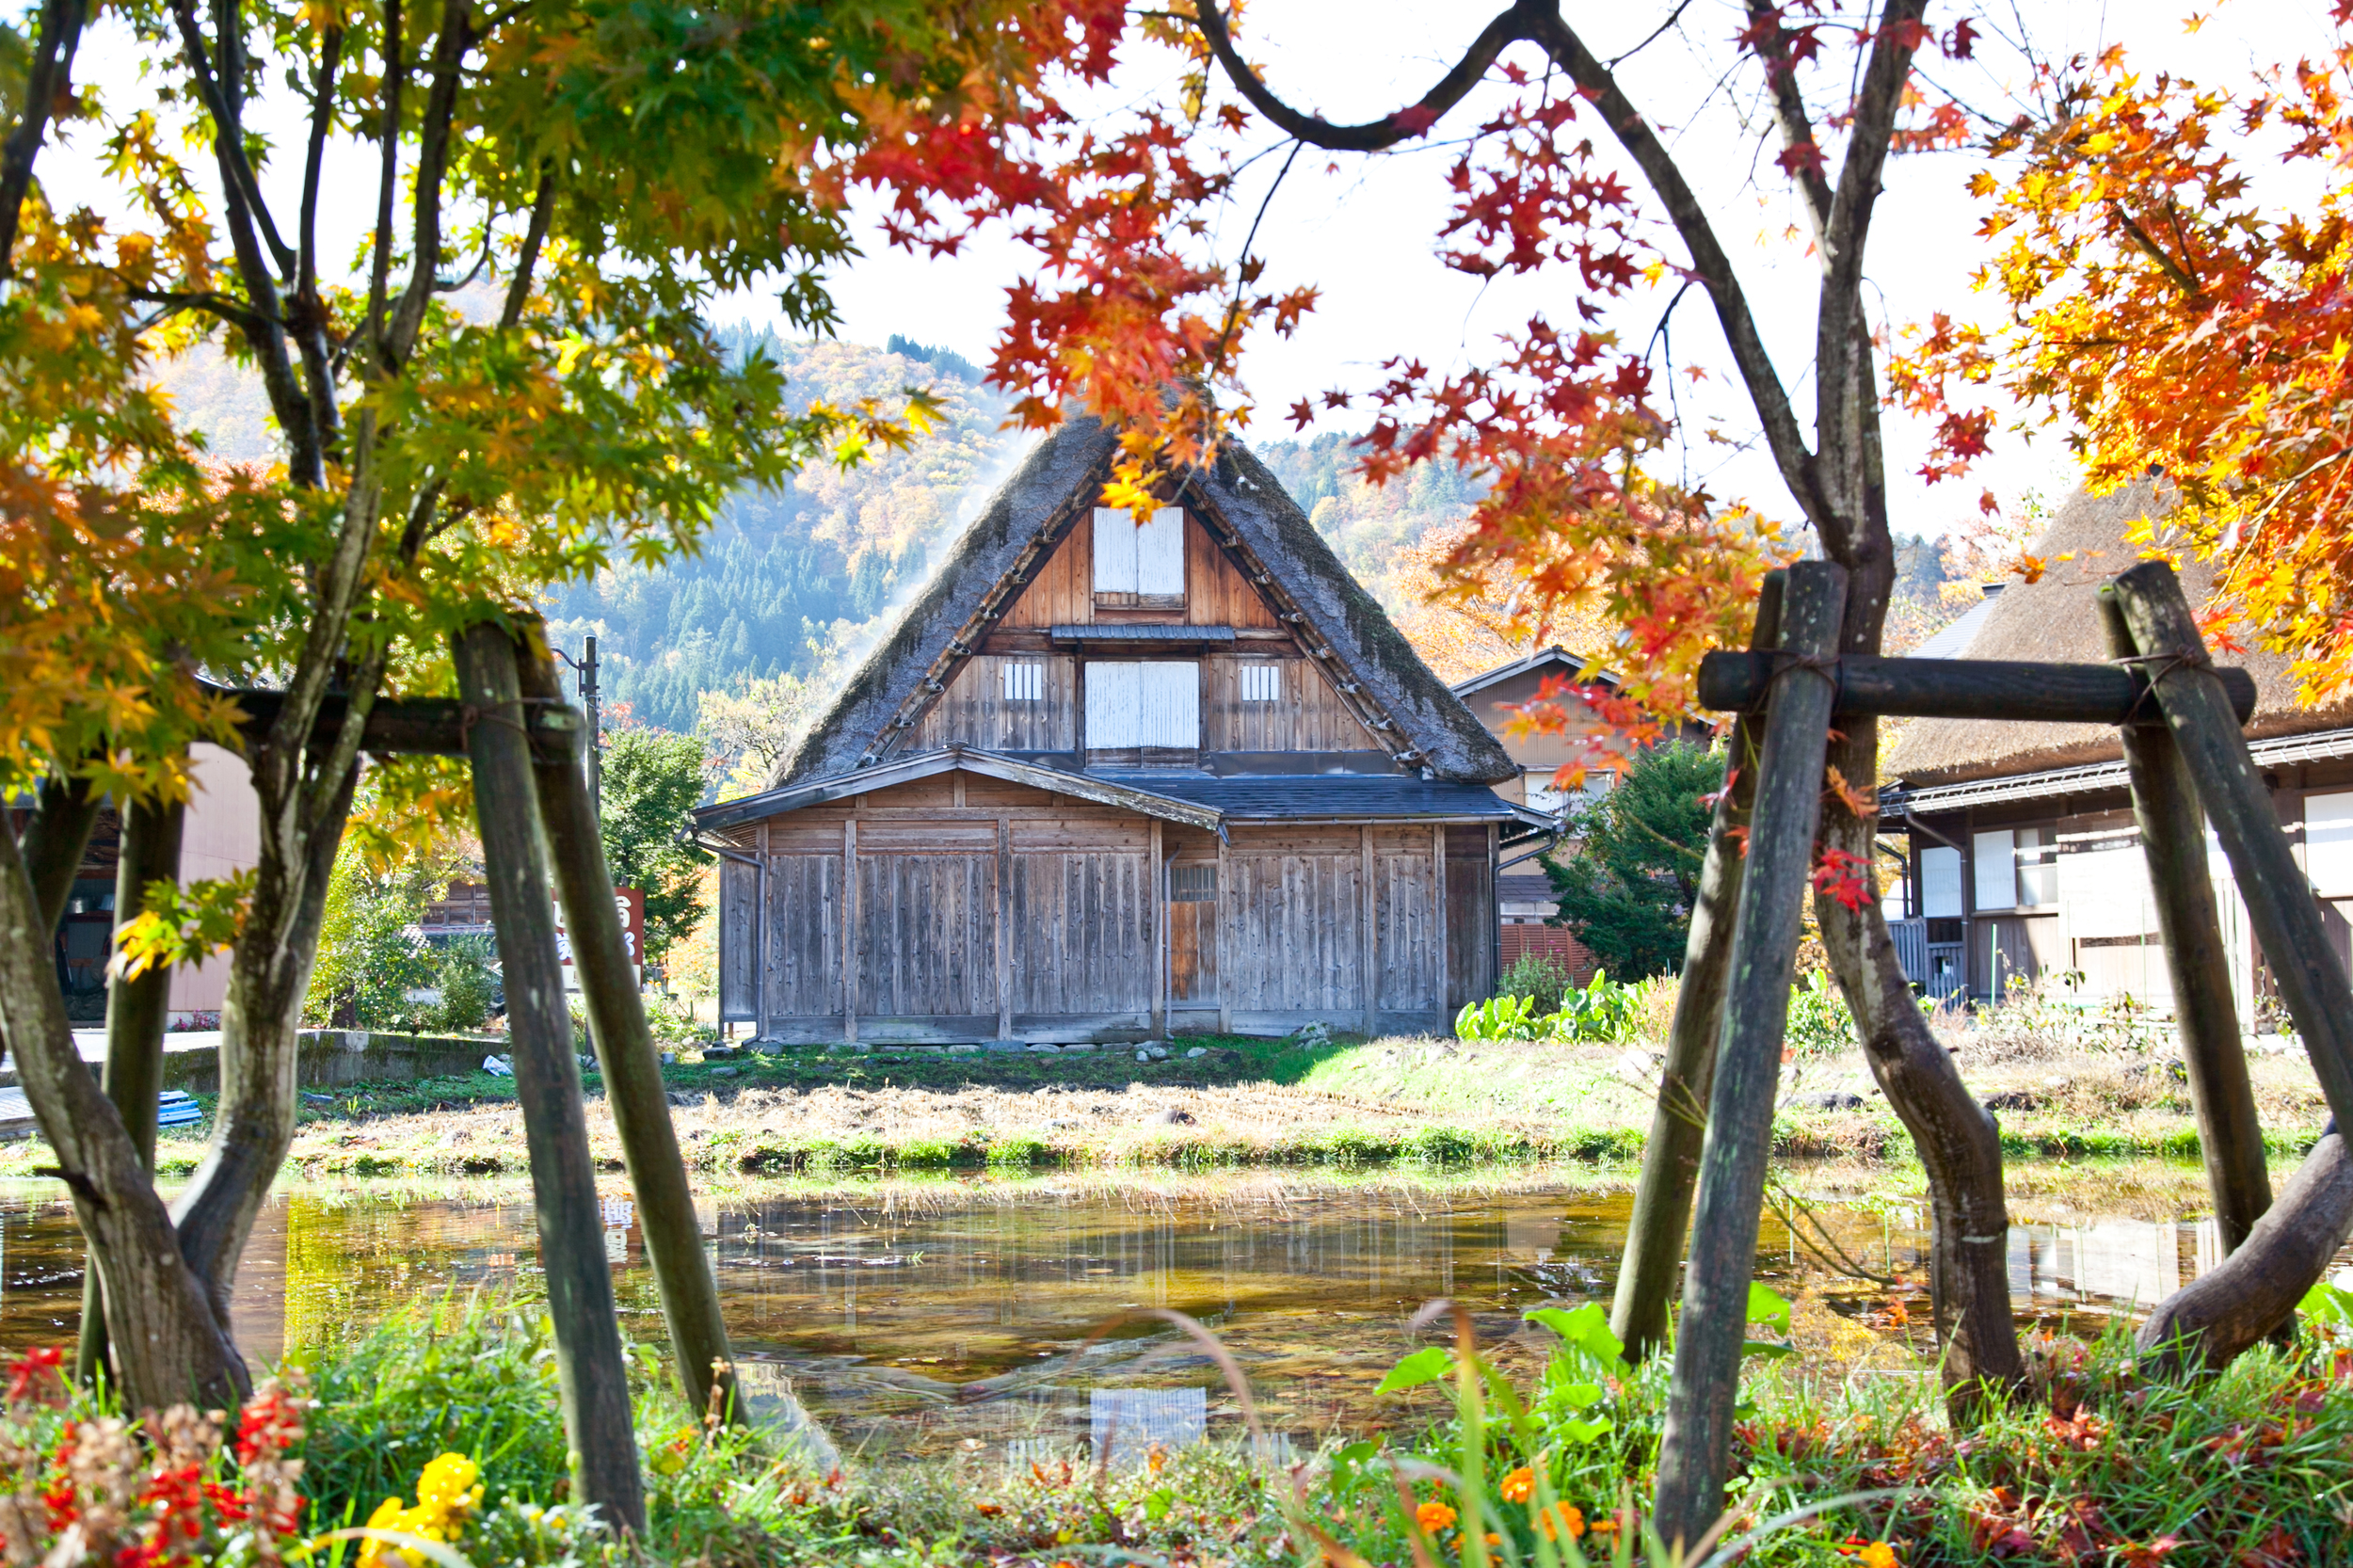 IMG_6911-shirakawa-go-takayama-japan-alps-trisa-taro.jpg